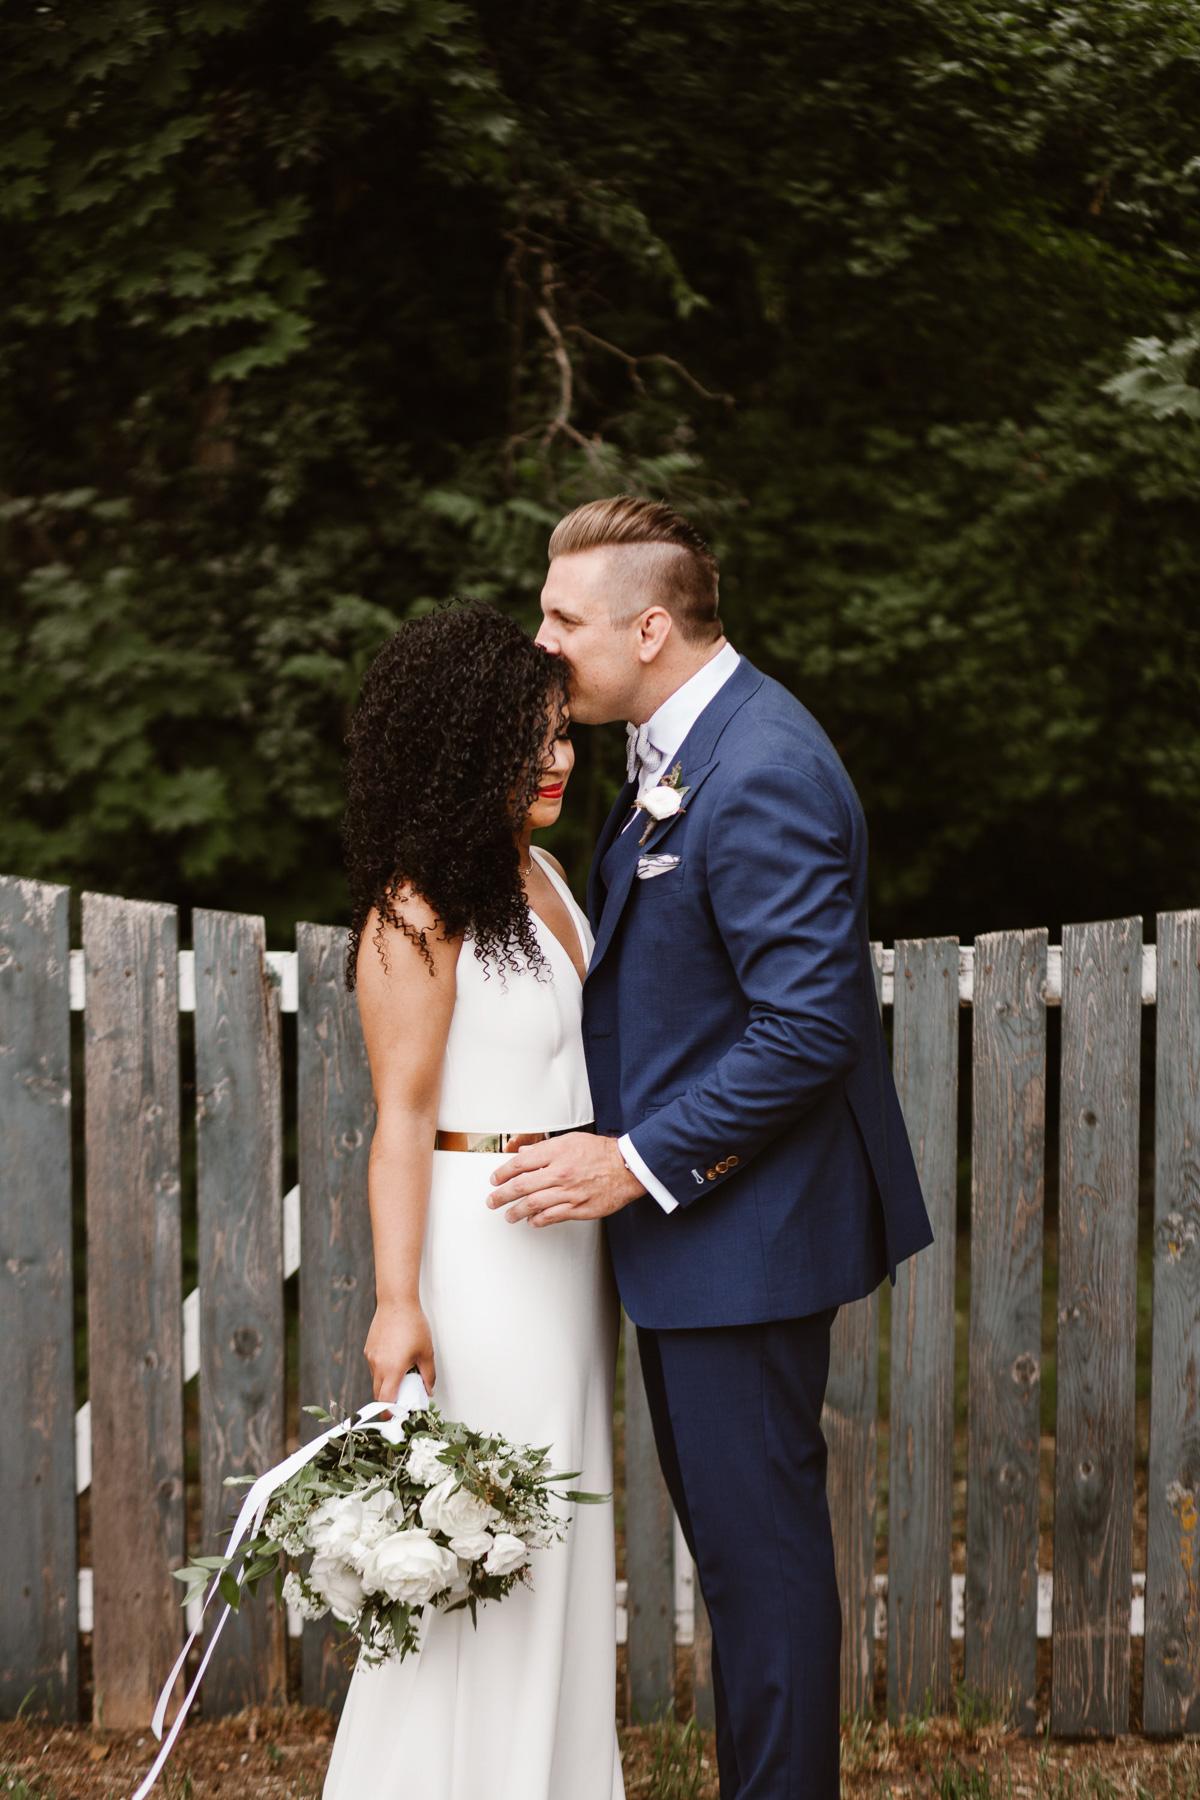 reed-photography-vineyard-bride-swish-list-stratus-winery-niagara-on-the-lake-wedding-23.jpg